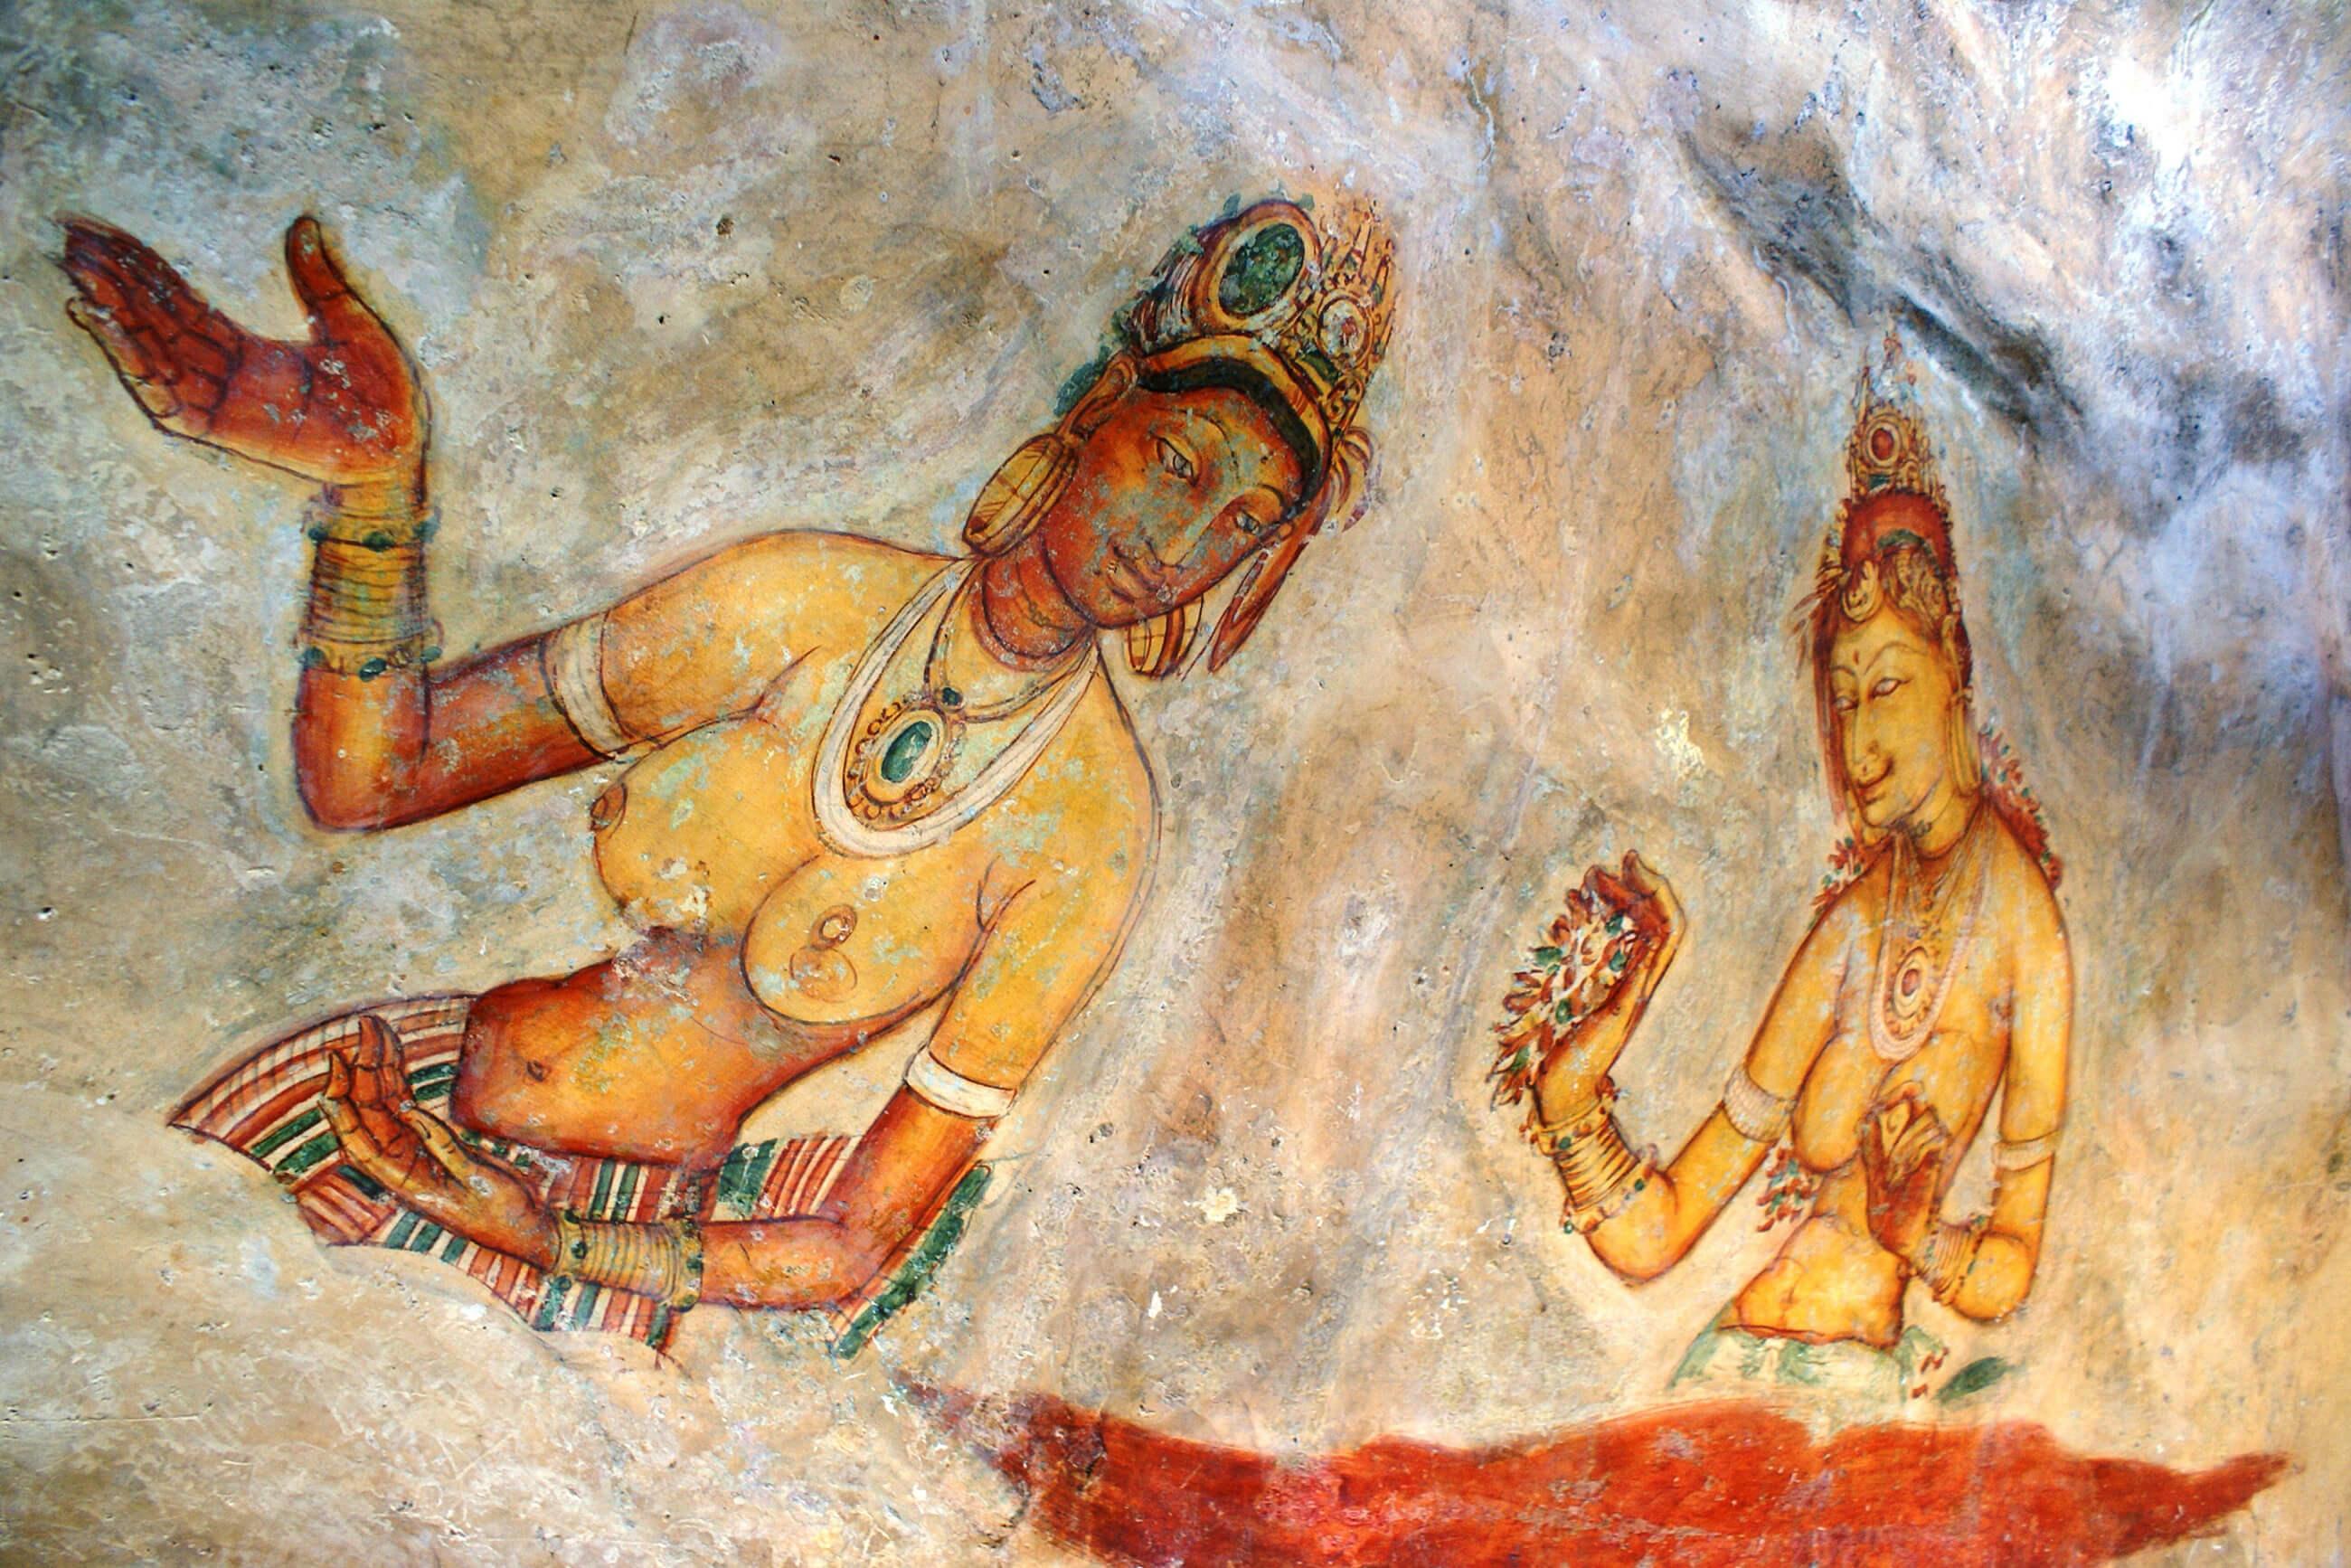 https://bubo.sk/uploads/galleries/7521/archiv_srilanka_sri-lanka-fam-marec-2009-196.jpg